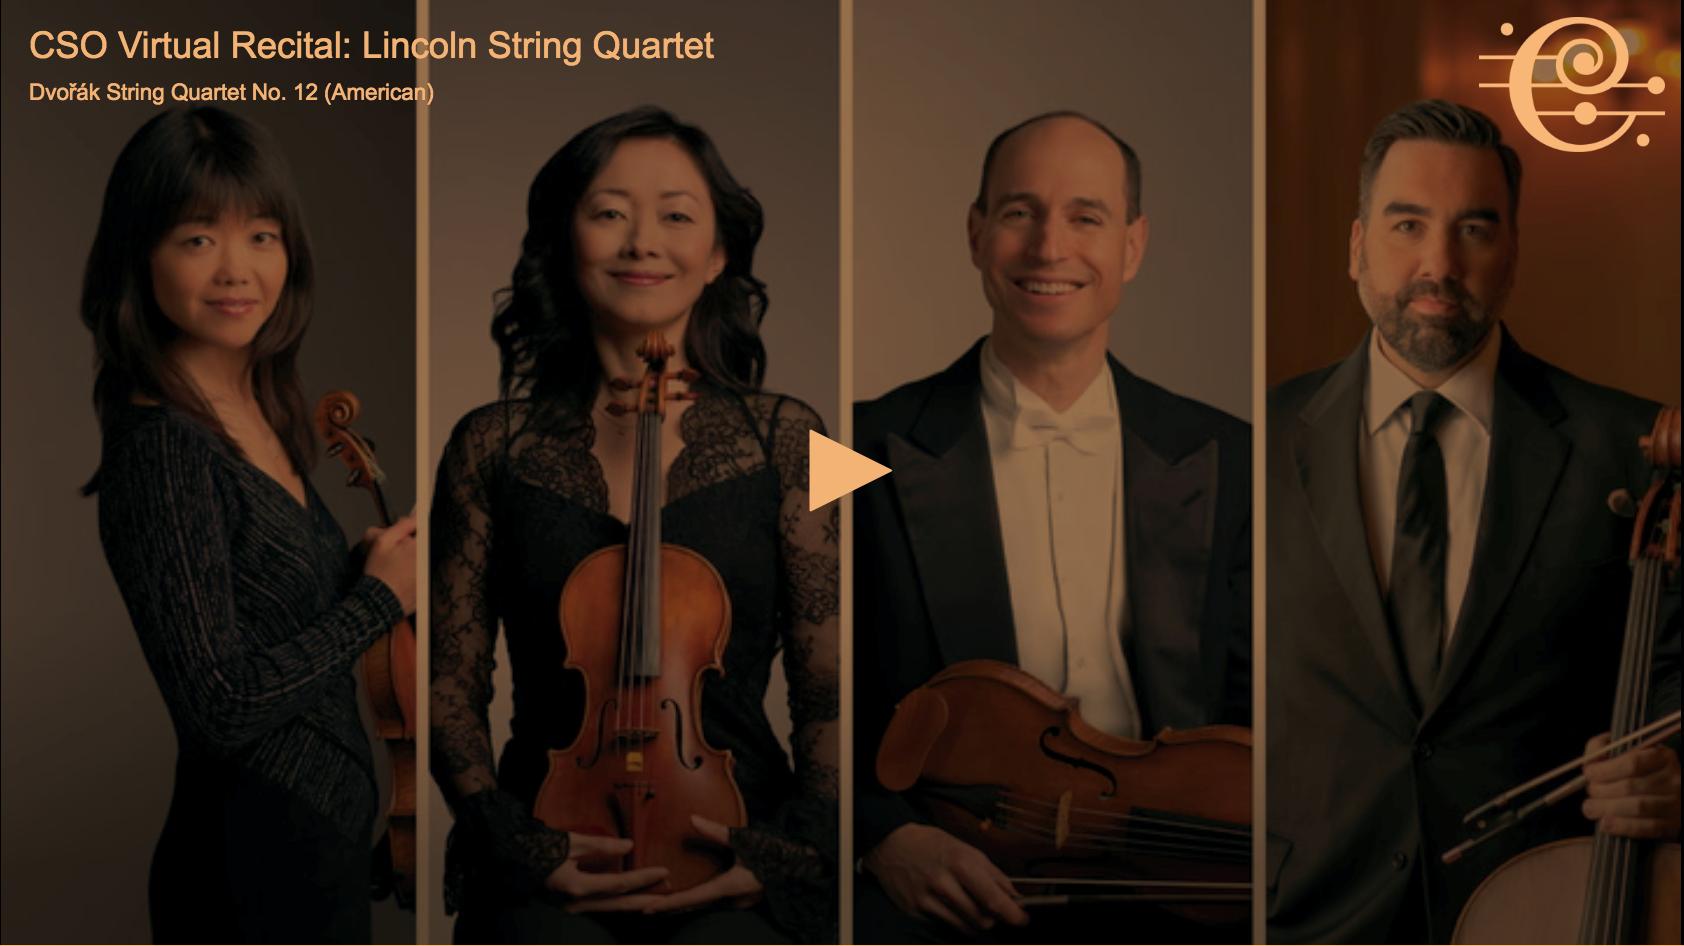 CSOtv: CSO Sessions: Virtual Recital: Lincoln String Quartet